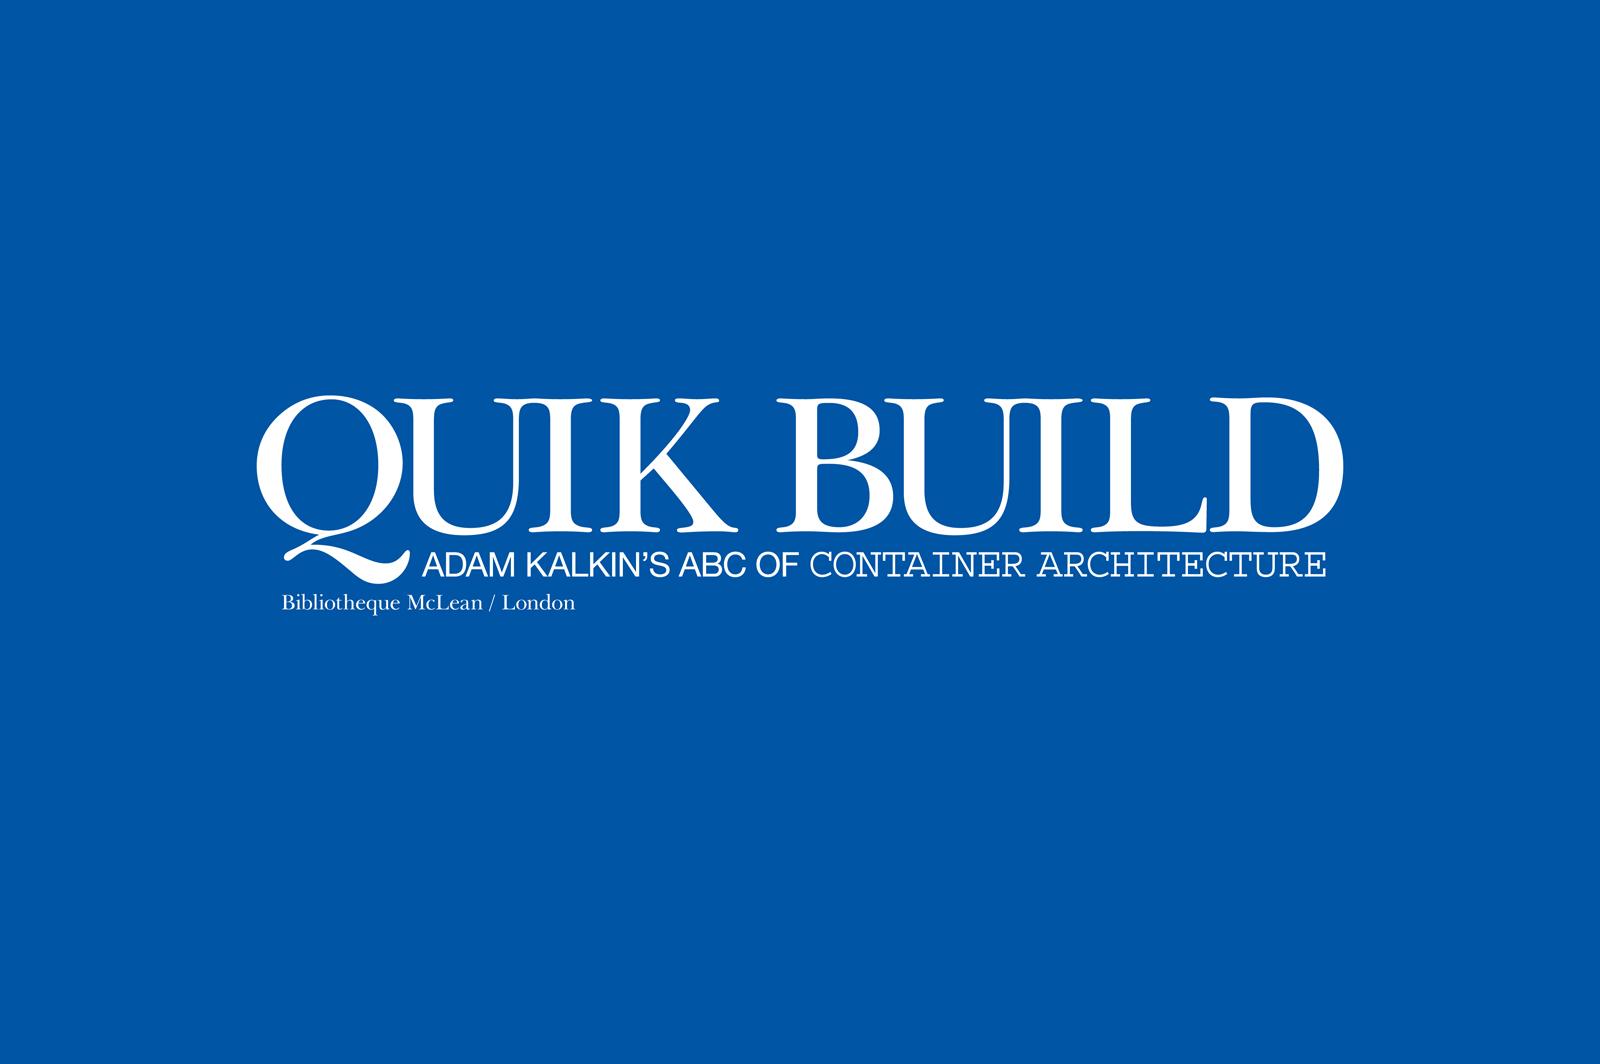 "Cover of <i>Quik Build: Adam Kalkin's ABC of Container Architecture</i> by <a href=""http://www.architectureandhygiene.com"">Adam Kalkin</a>. Image courtesy of Adam Kalkin."